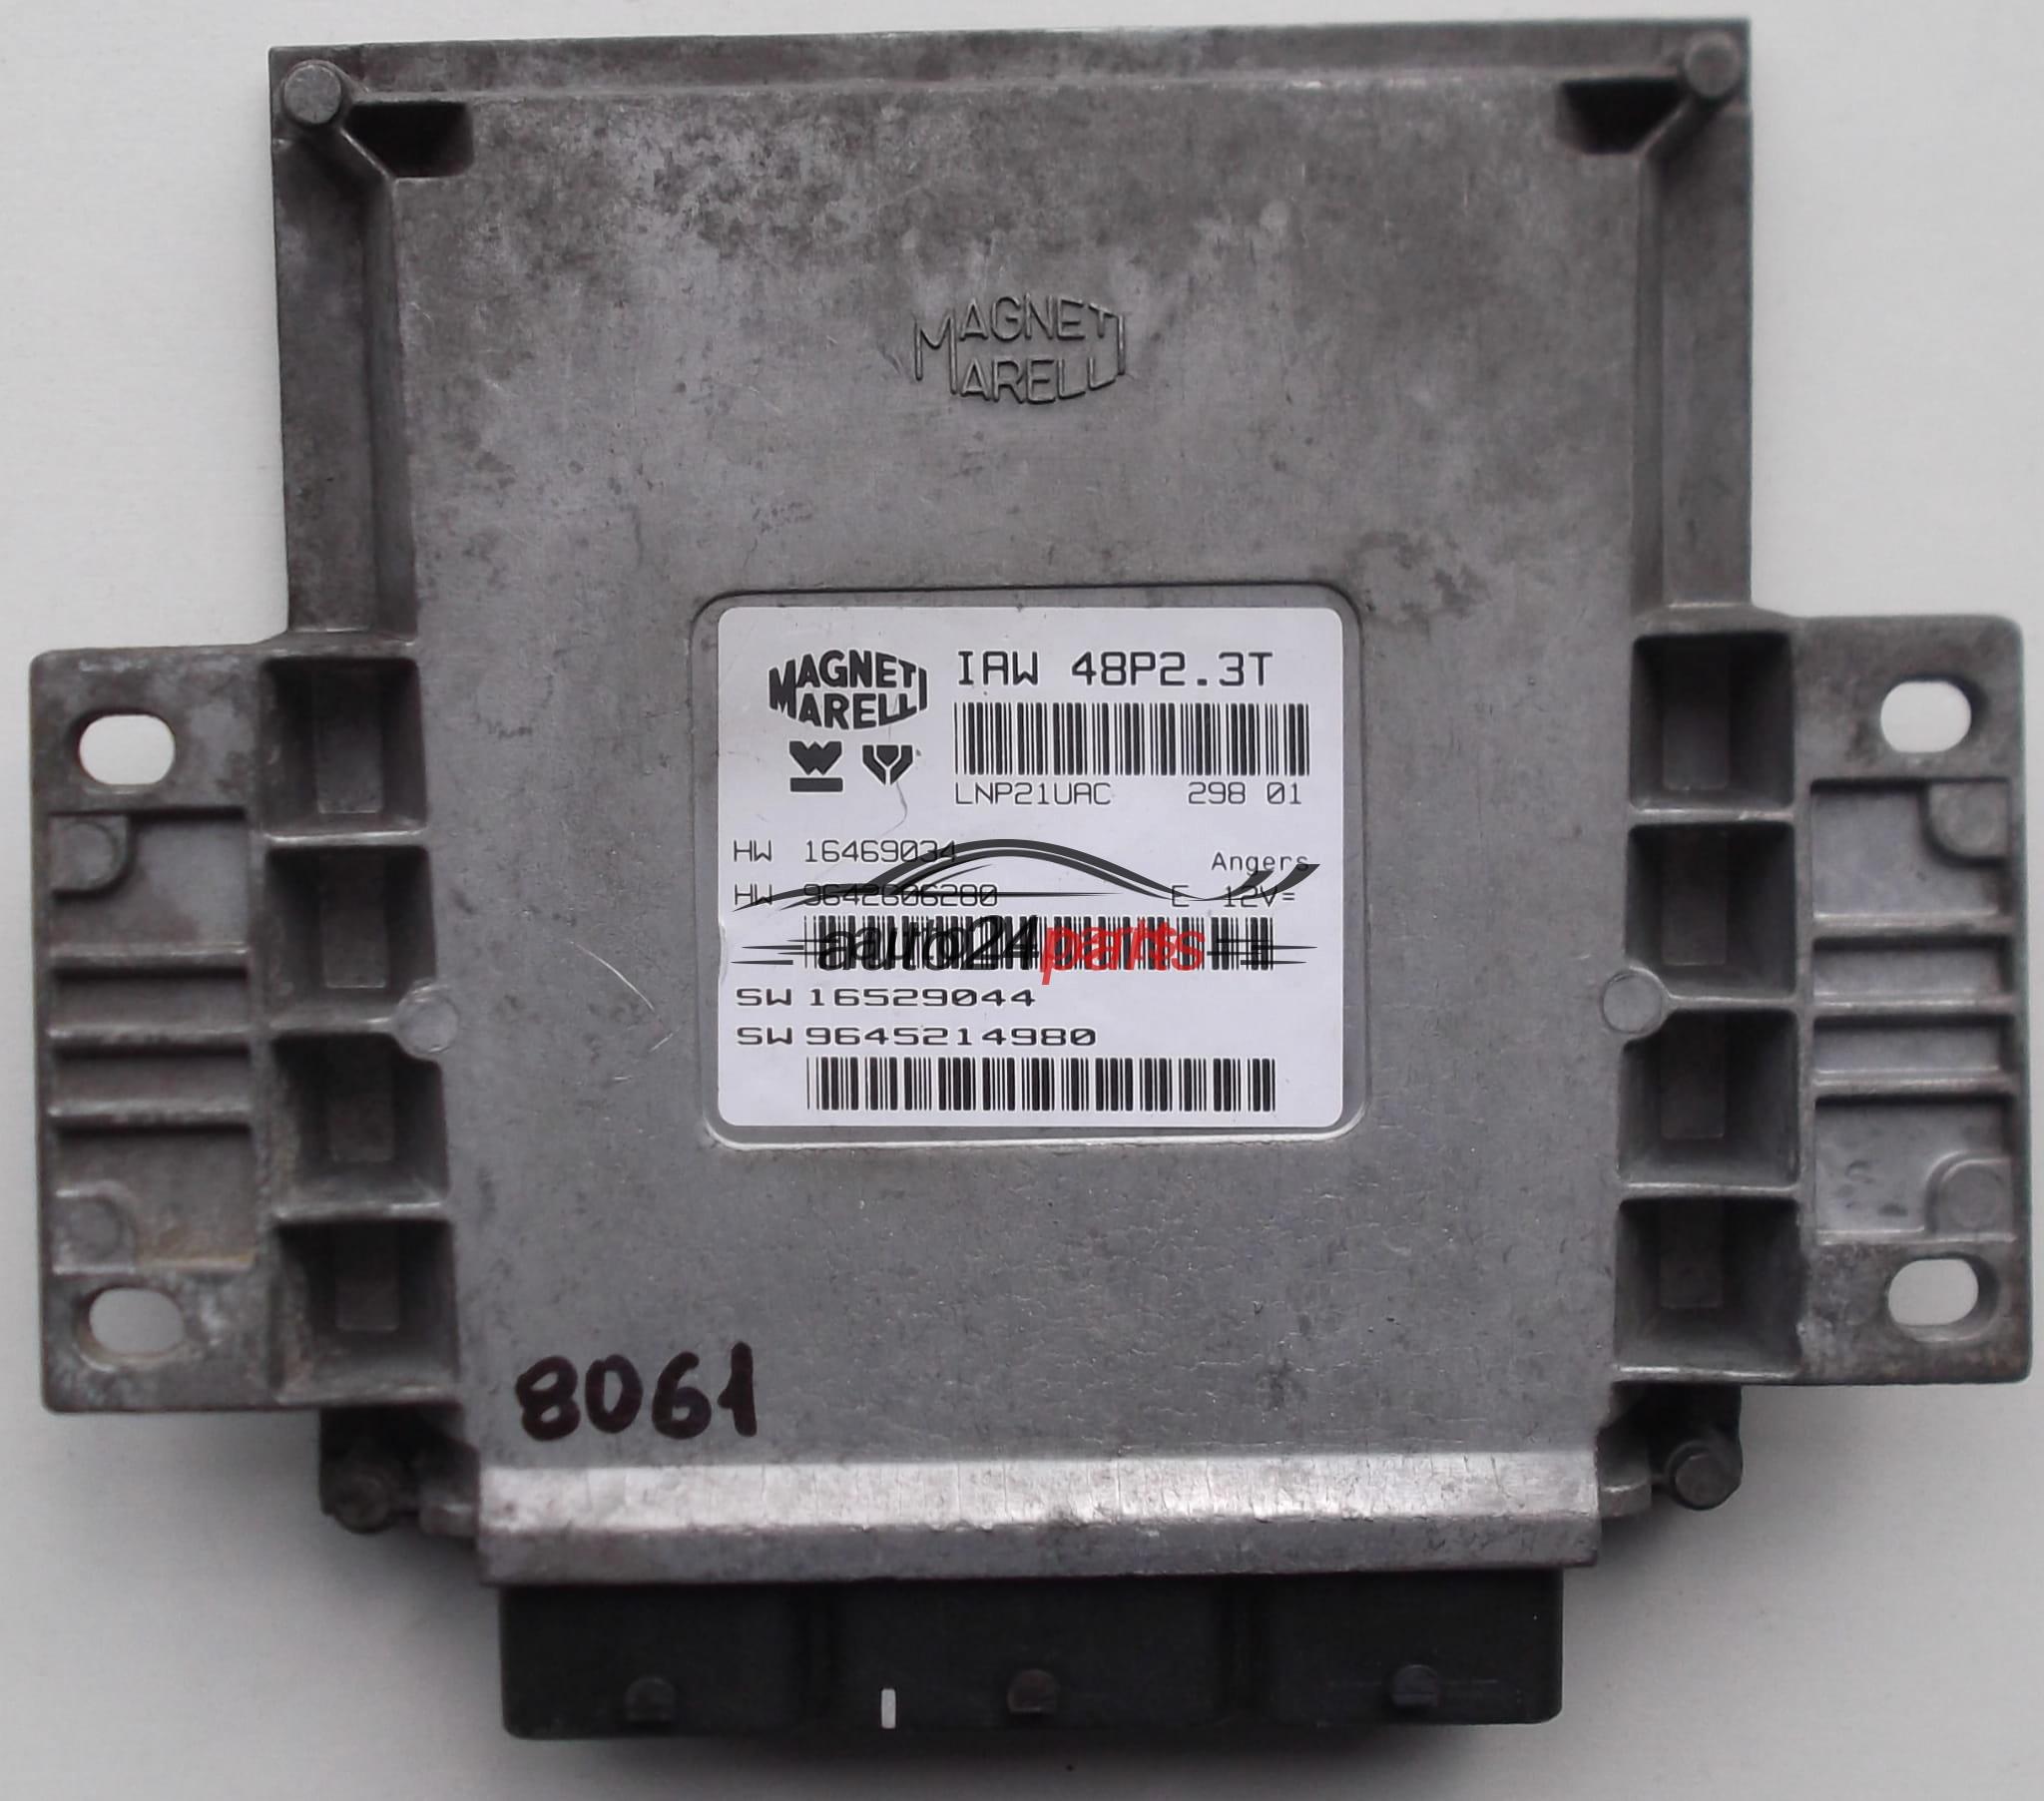 ECU ENGINE CONTROLLER PEUGEOT 206 MAGNETI MARELLI IAW 48P2.3T ...